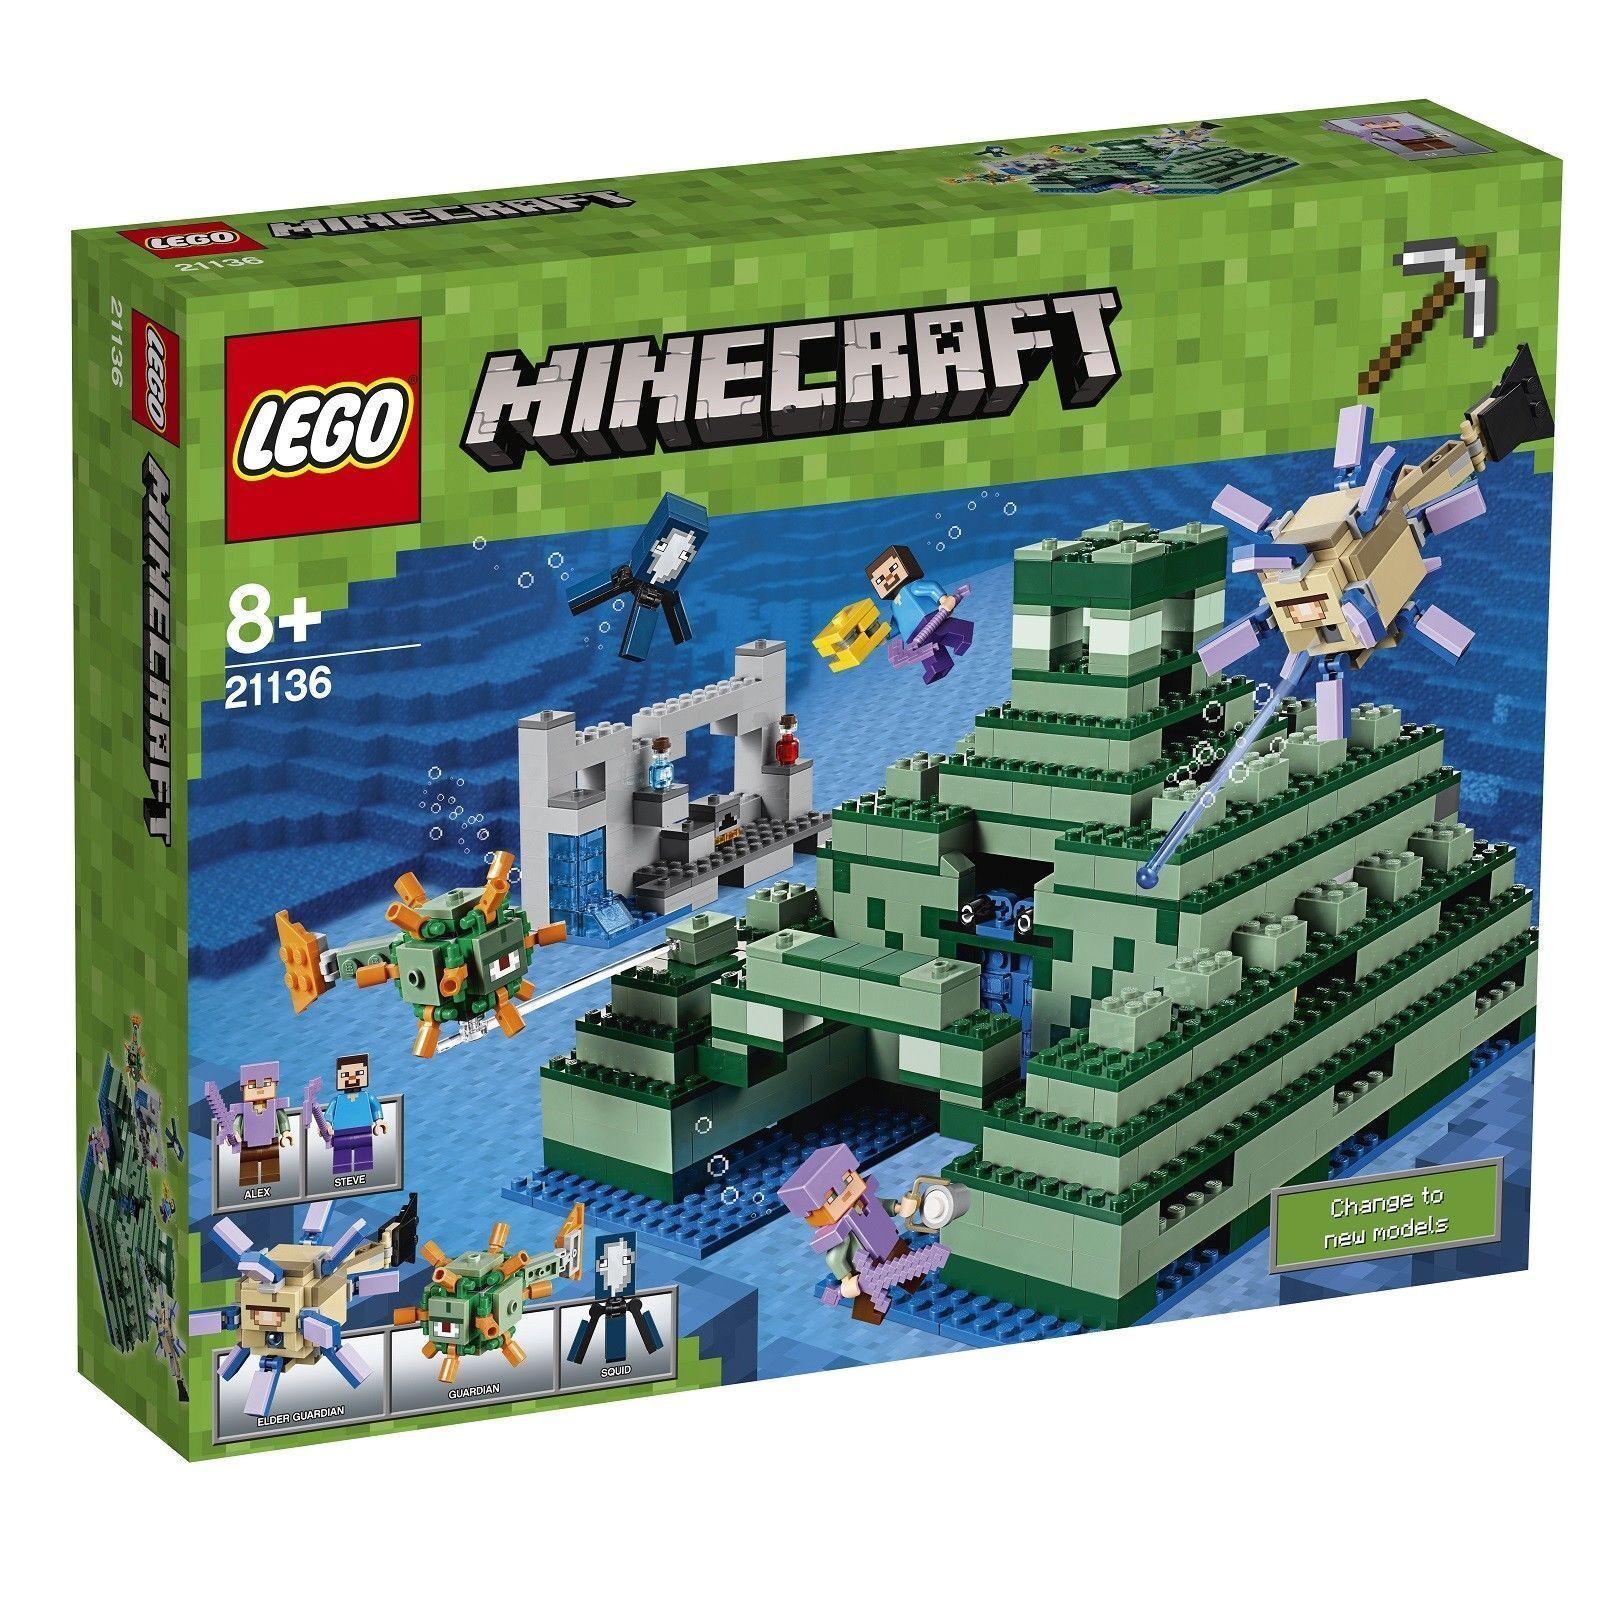 Lego Minecraft The Ocean Monument 21136 - BRAND NEW